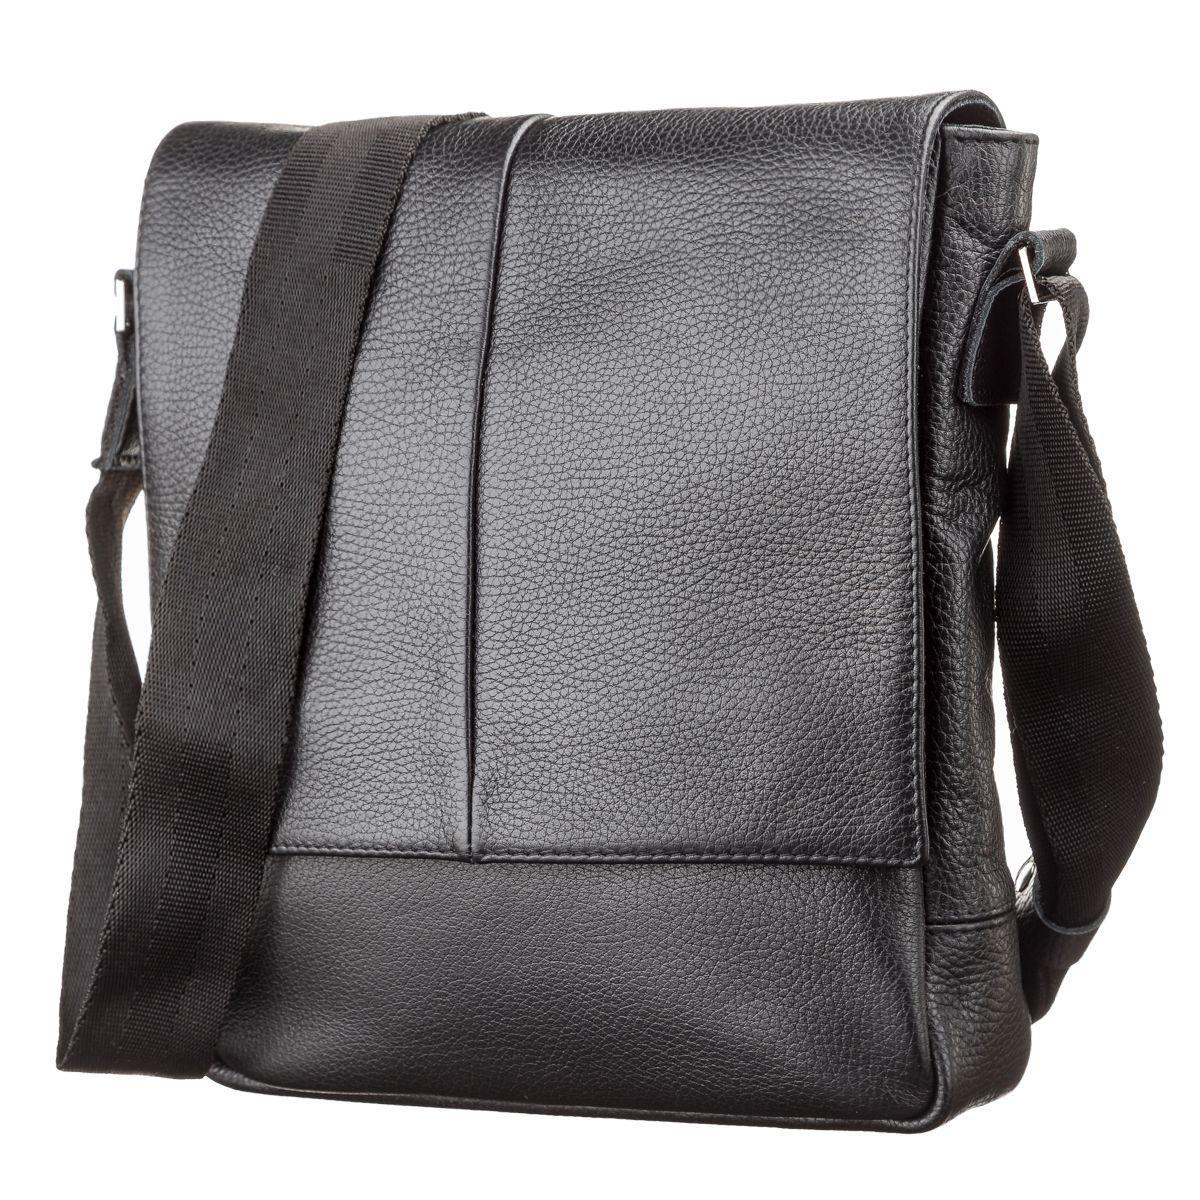 058c2e07e585 Черная мужская сумка кожаная через плечо SHVIGEL 00861 - Цена ...